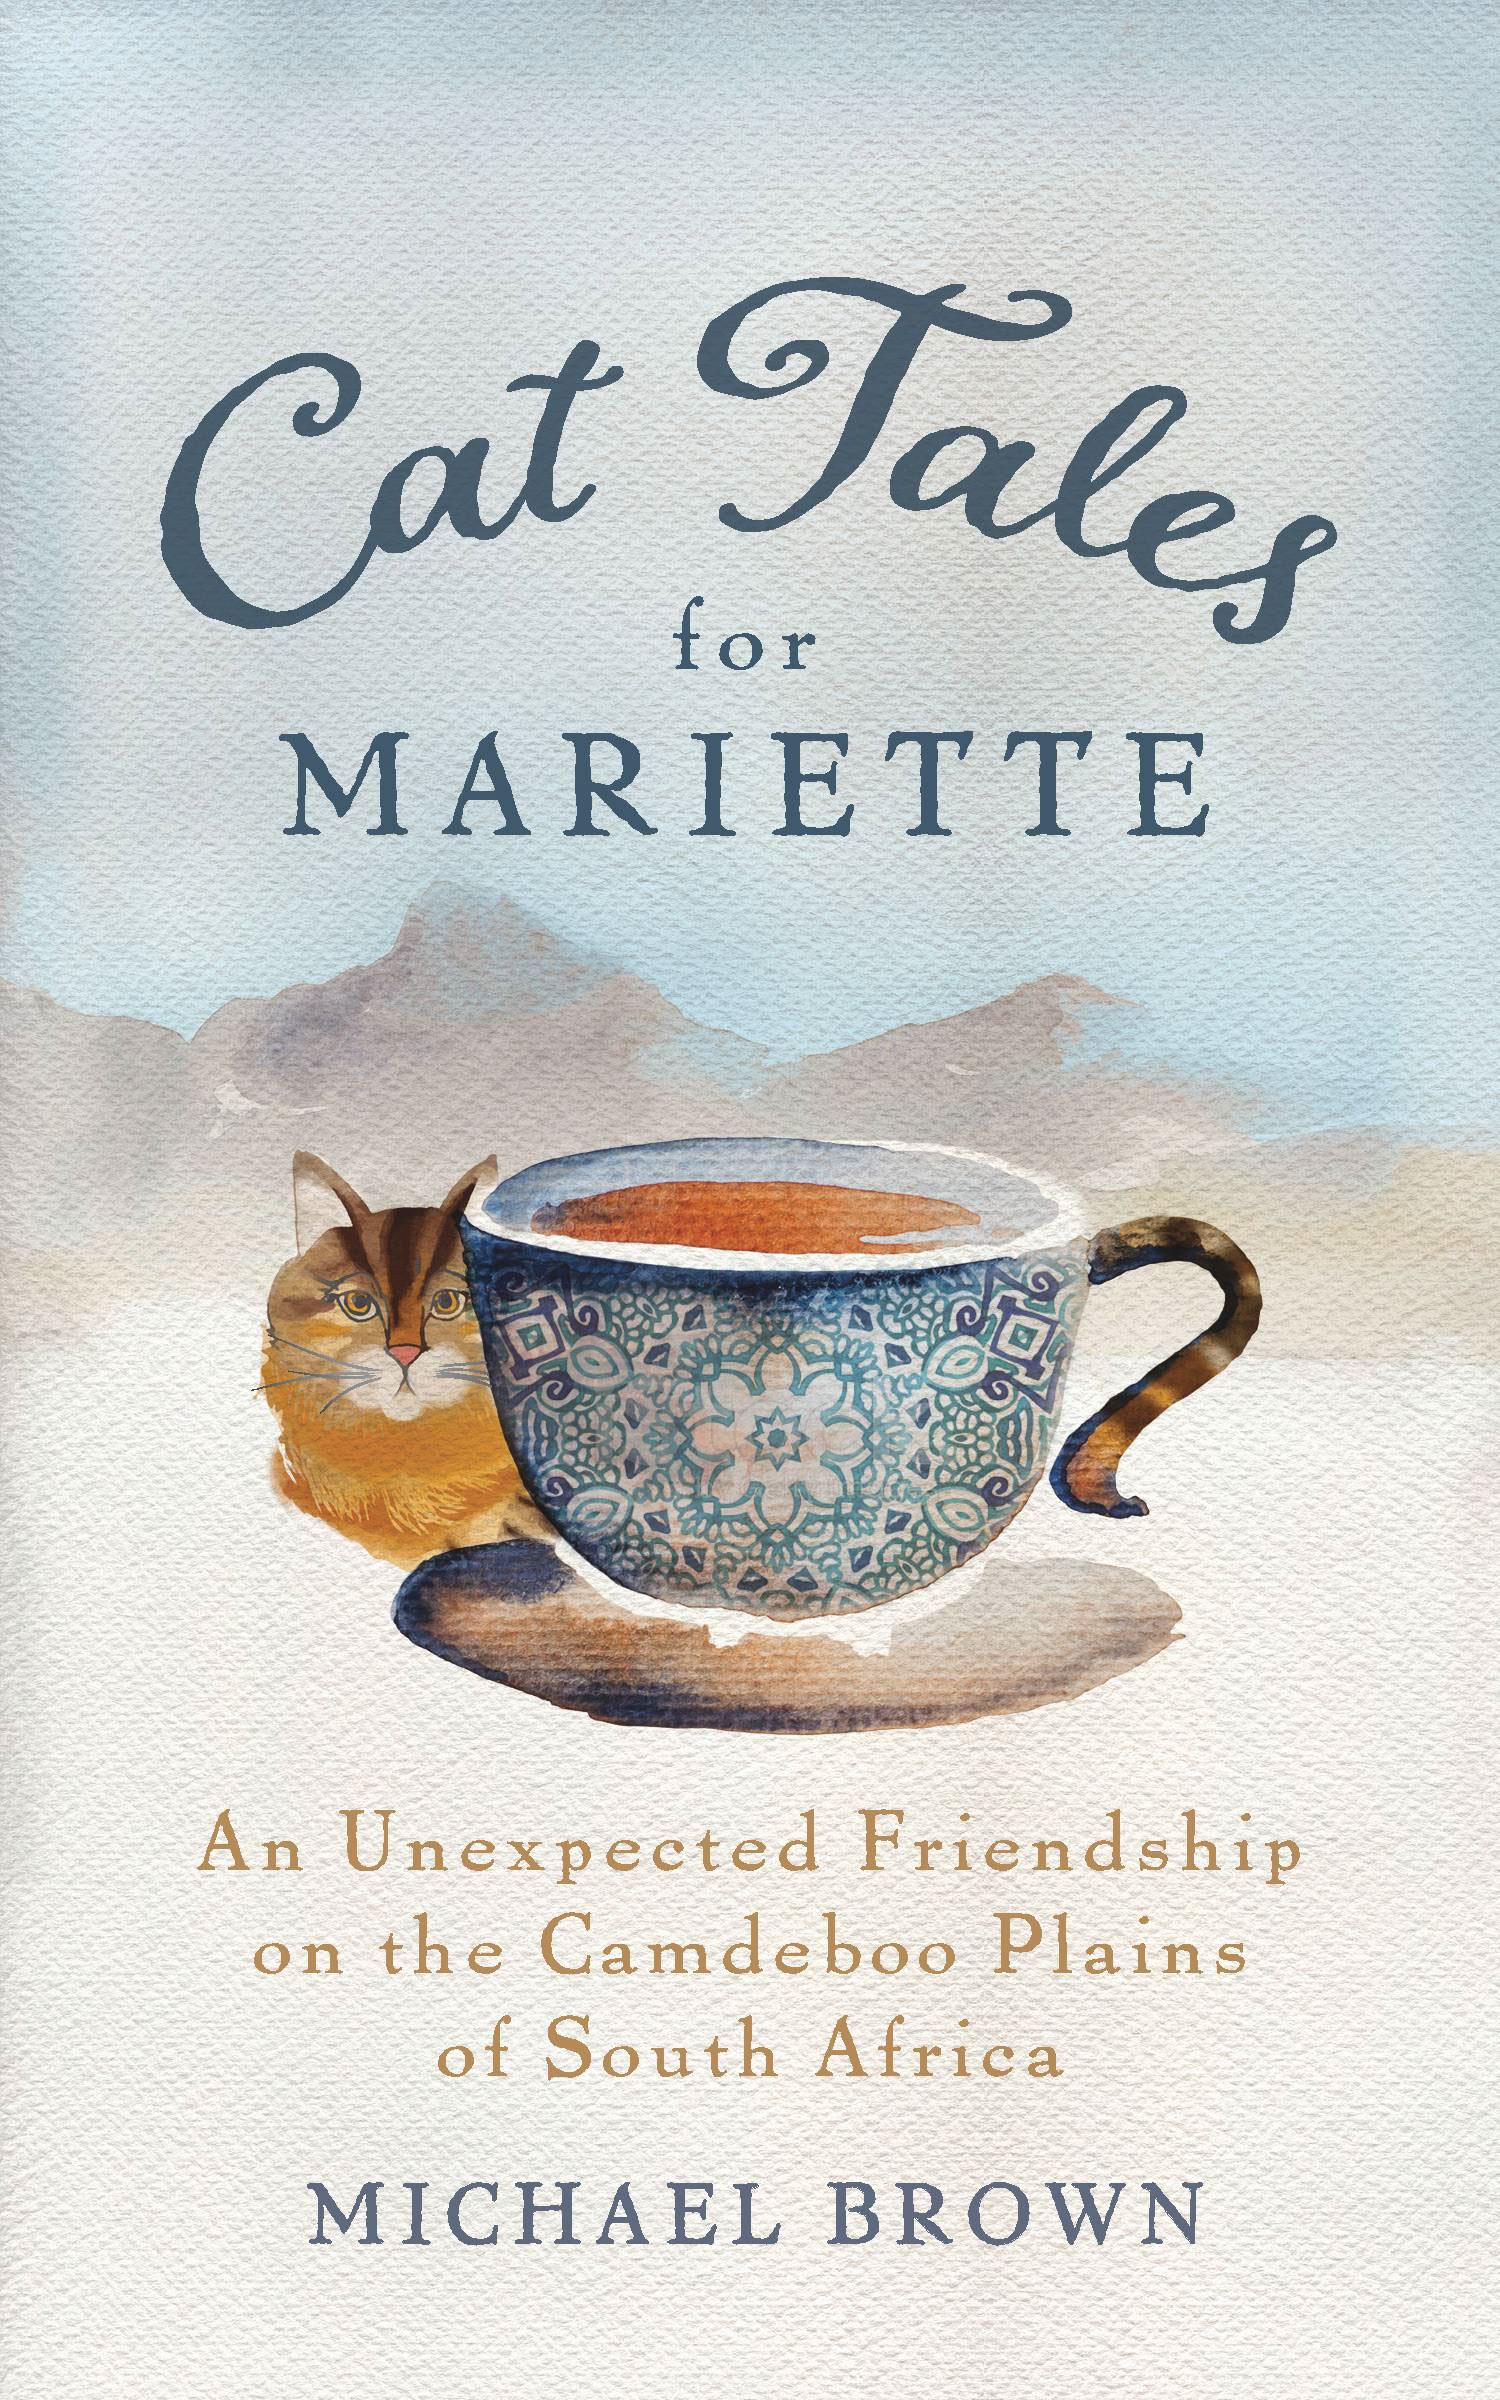 CAT TALES FOR MARIETTE  Michael Brown